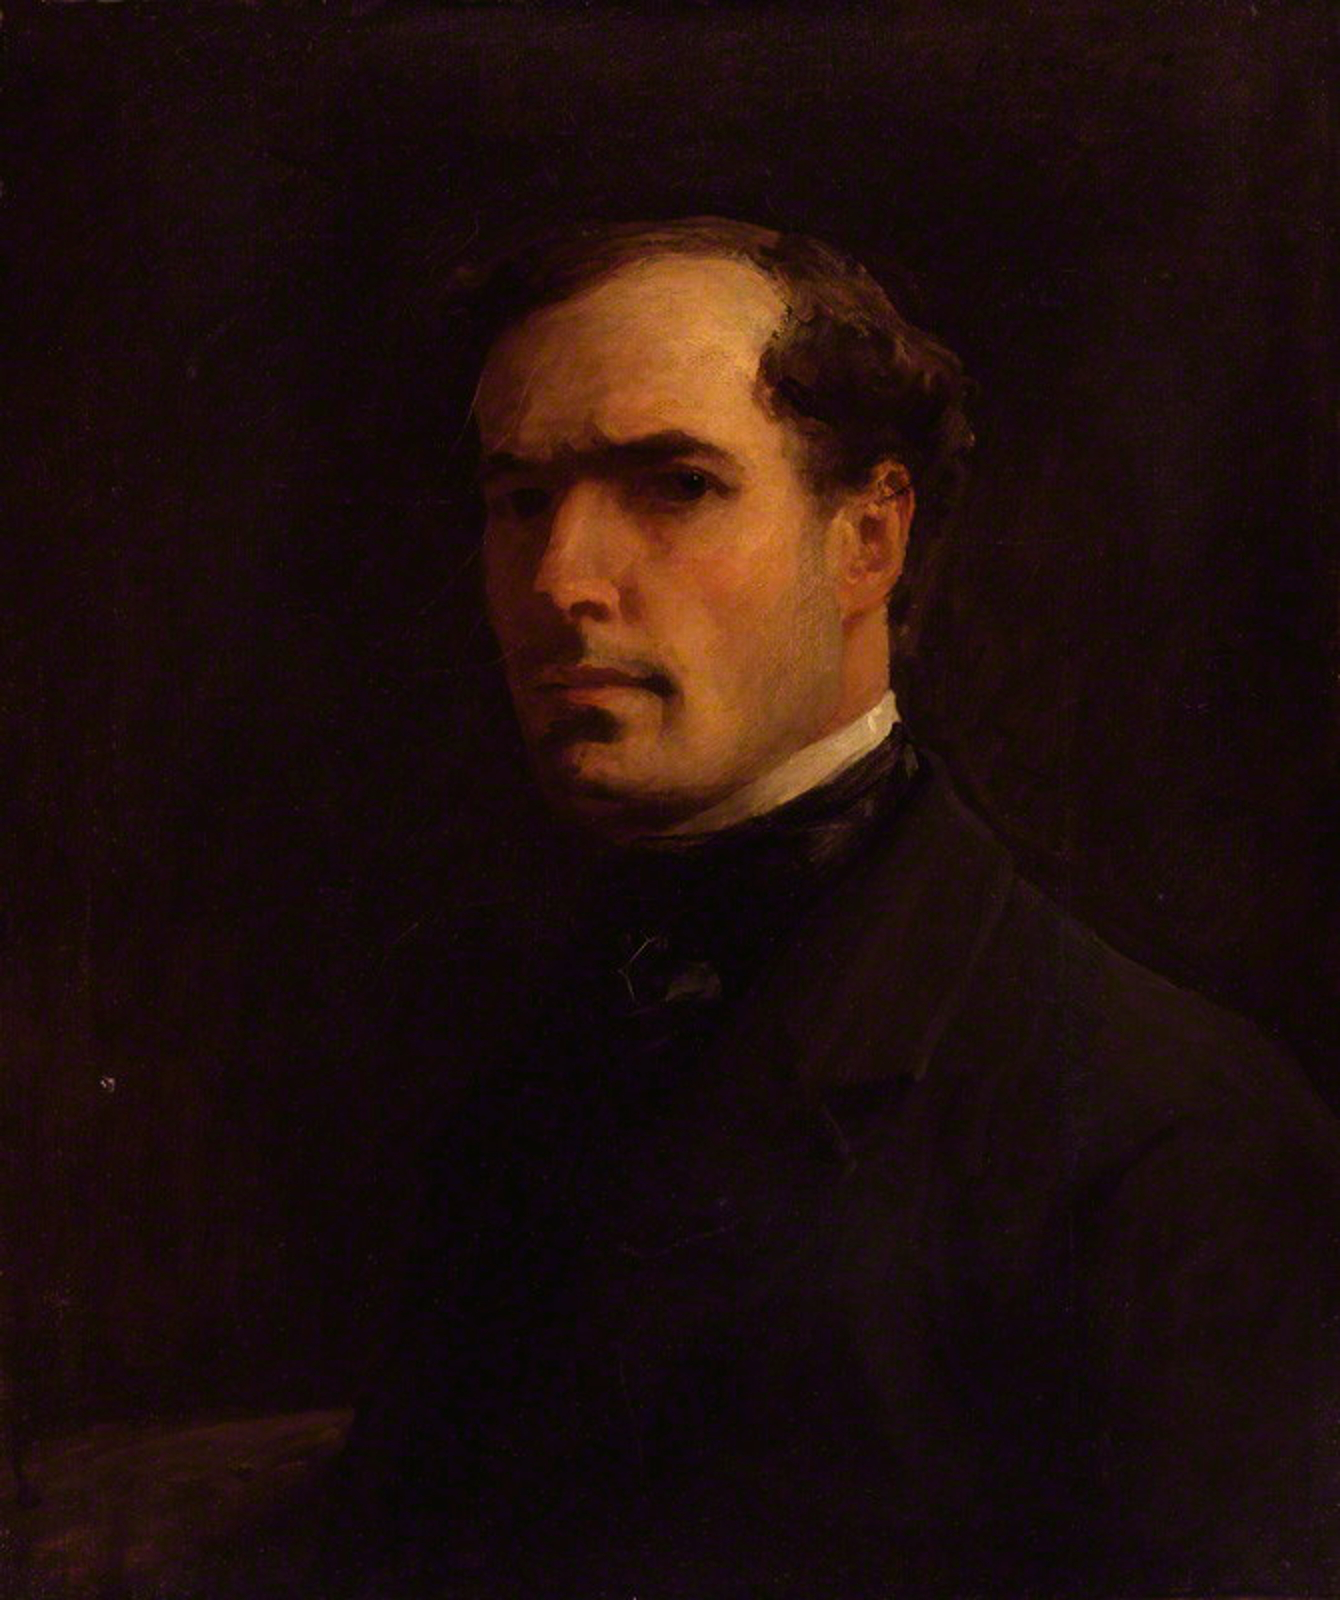 Image of Reginald Grenville Eves from Wikidata